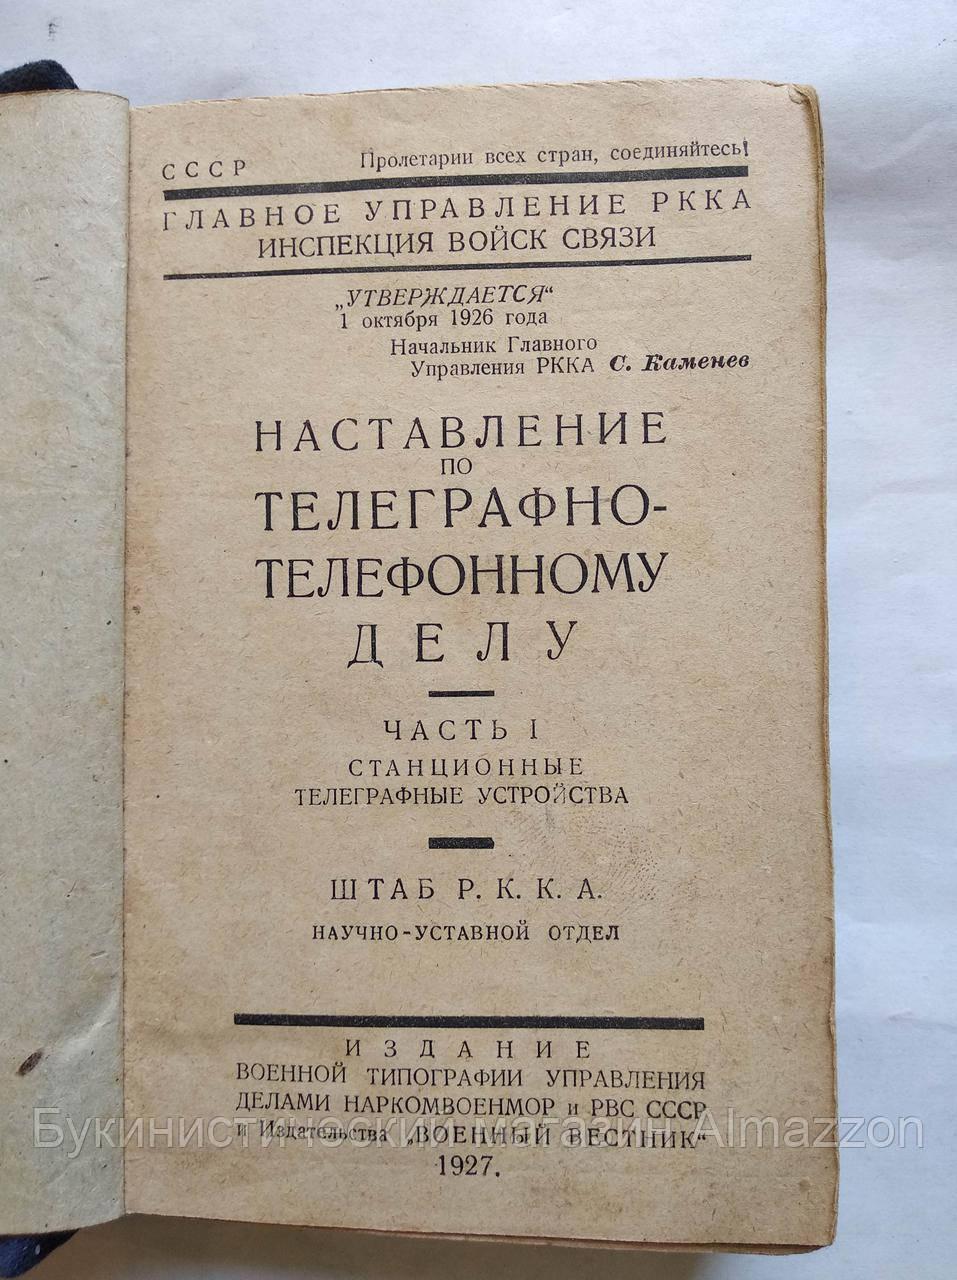 Наставление по телеграфно-телефонному делу. РККА 1927 год